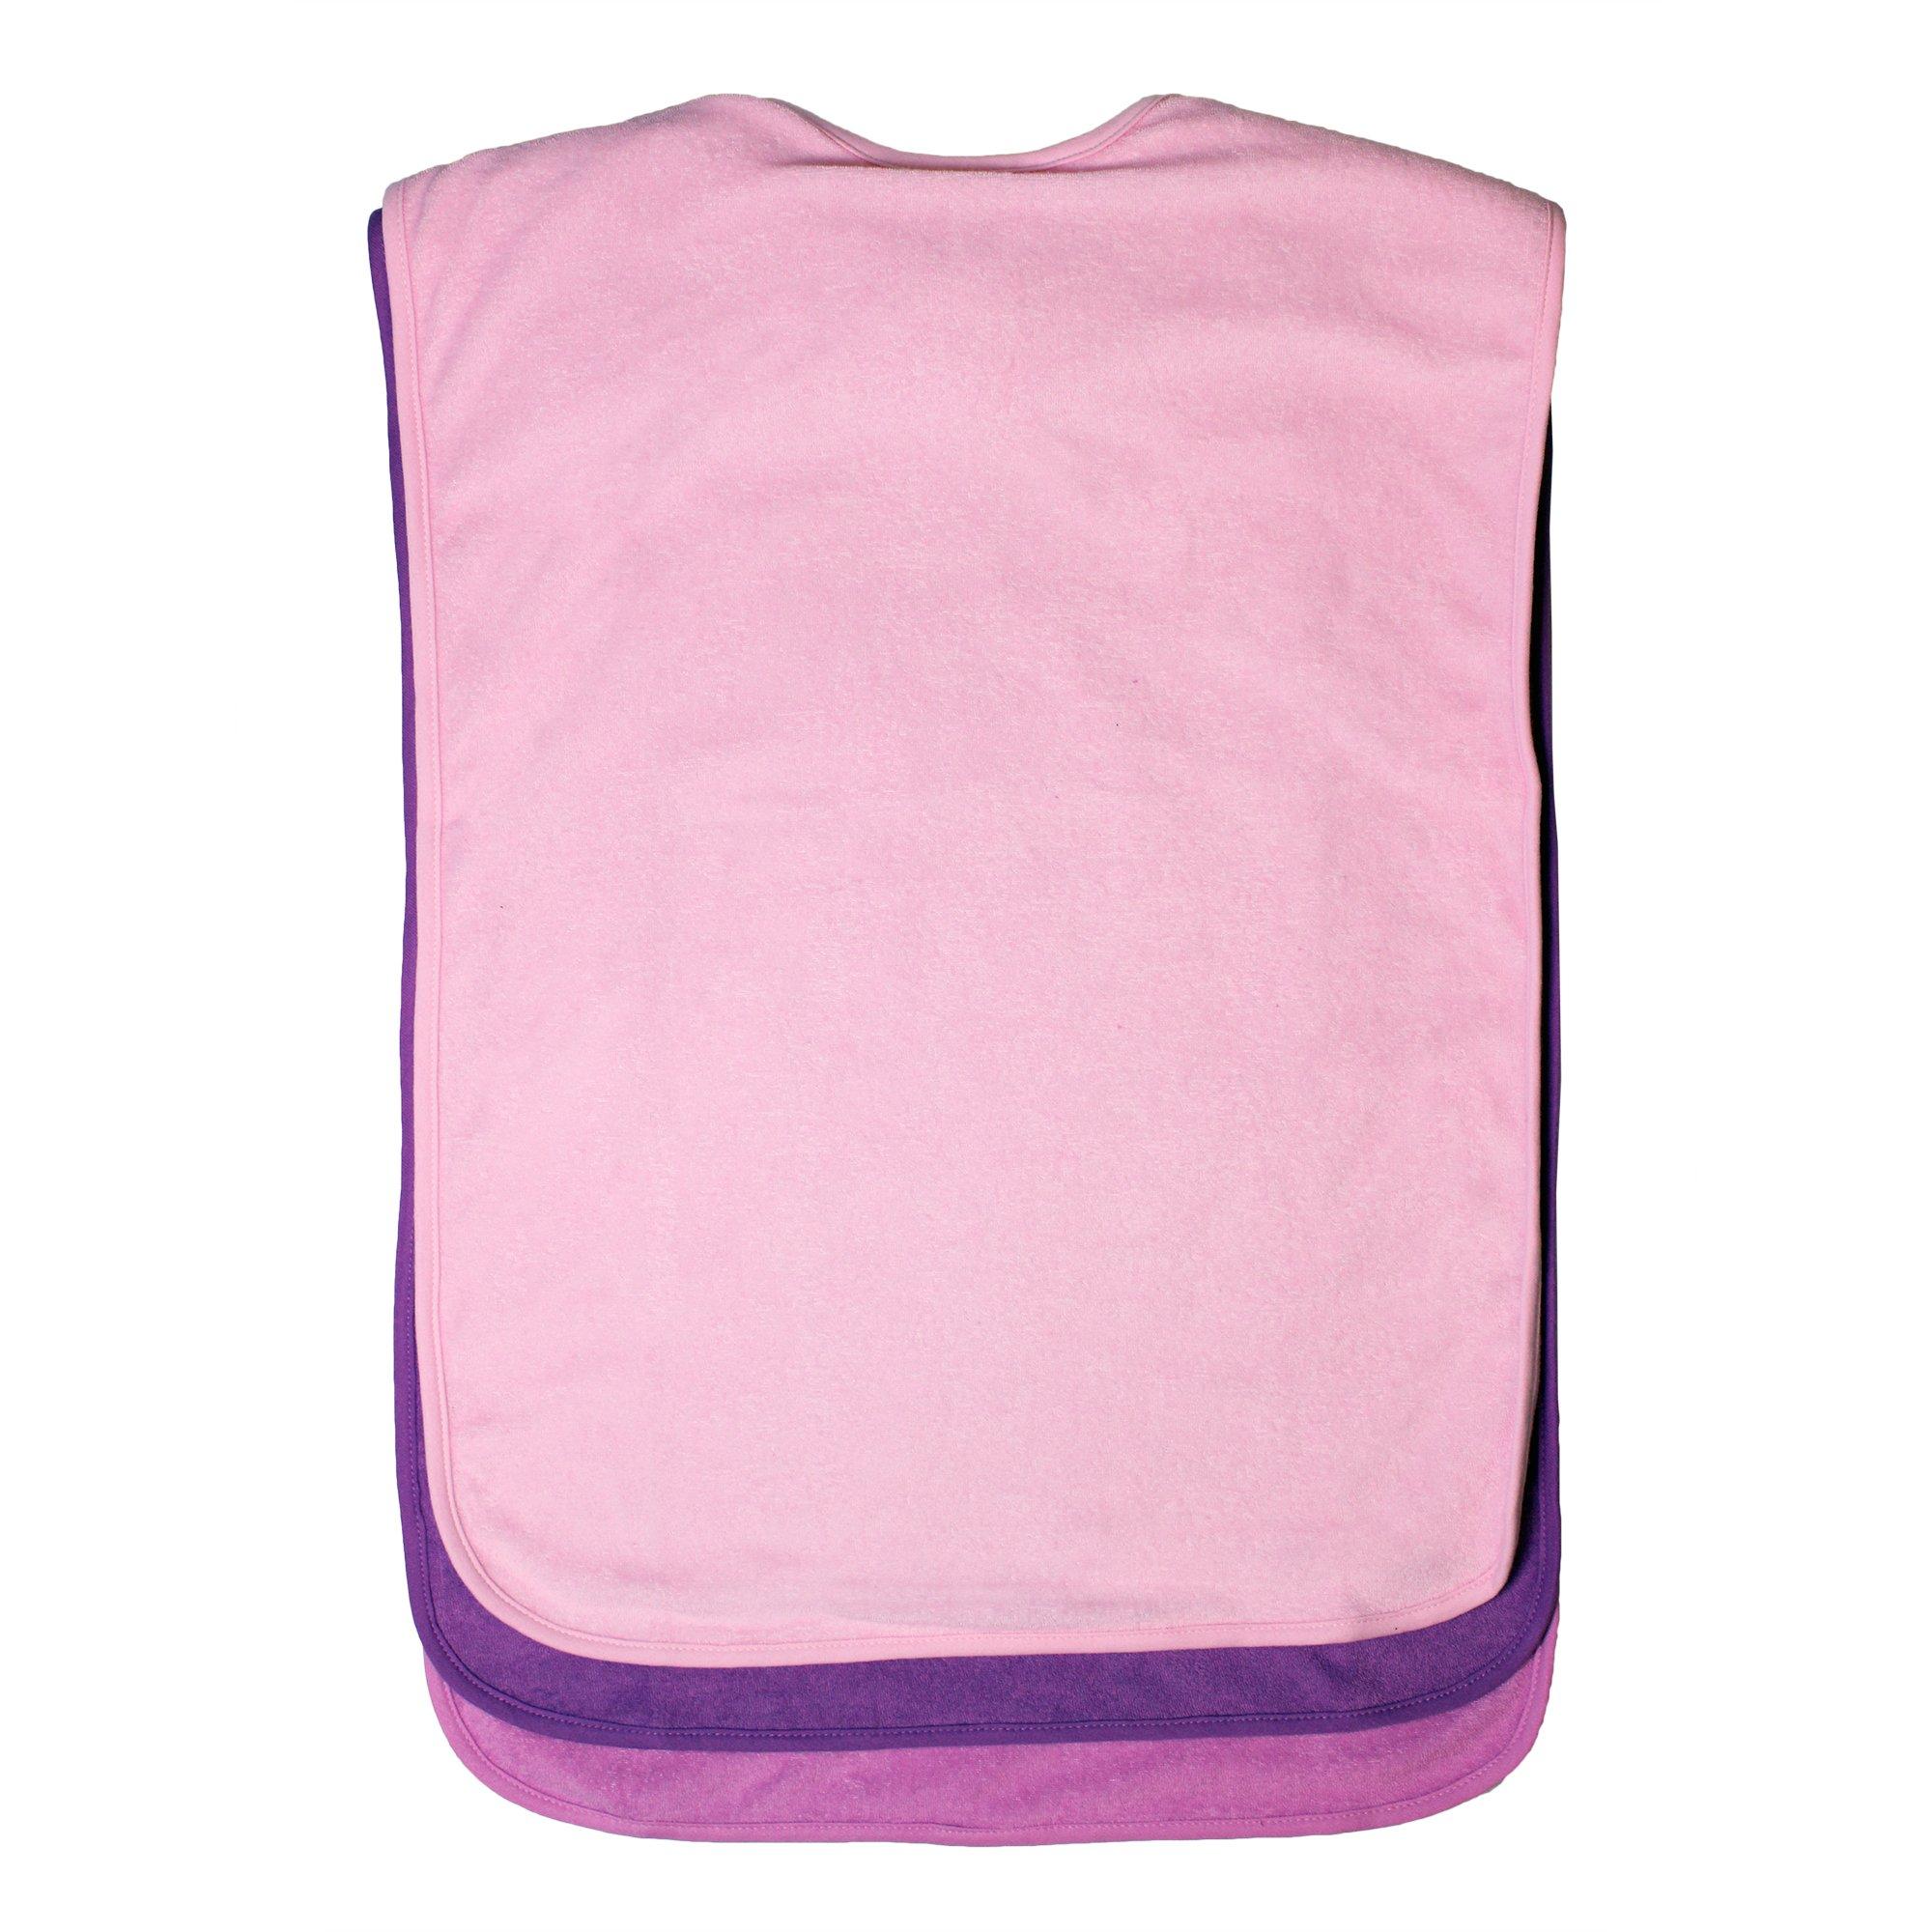 Ladies Adult Waterproof Bibs, 3 pack, Frenchie Mini Couture